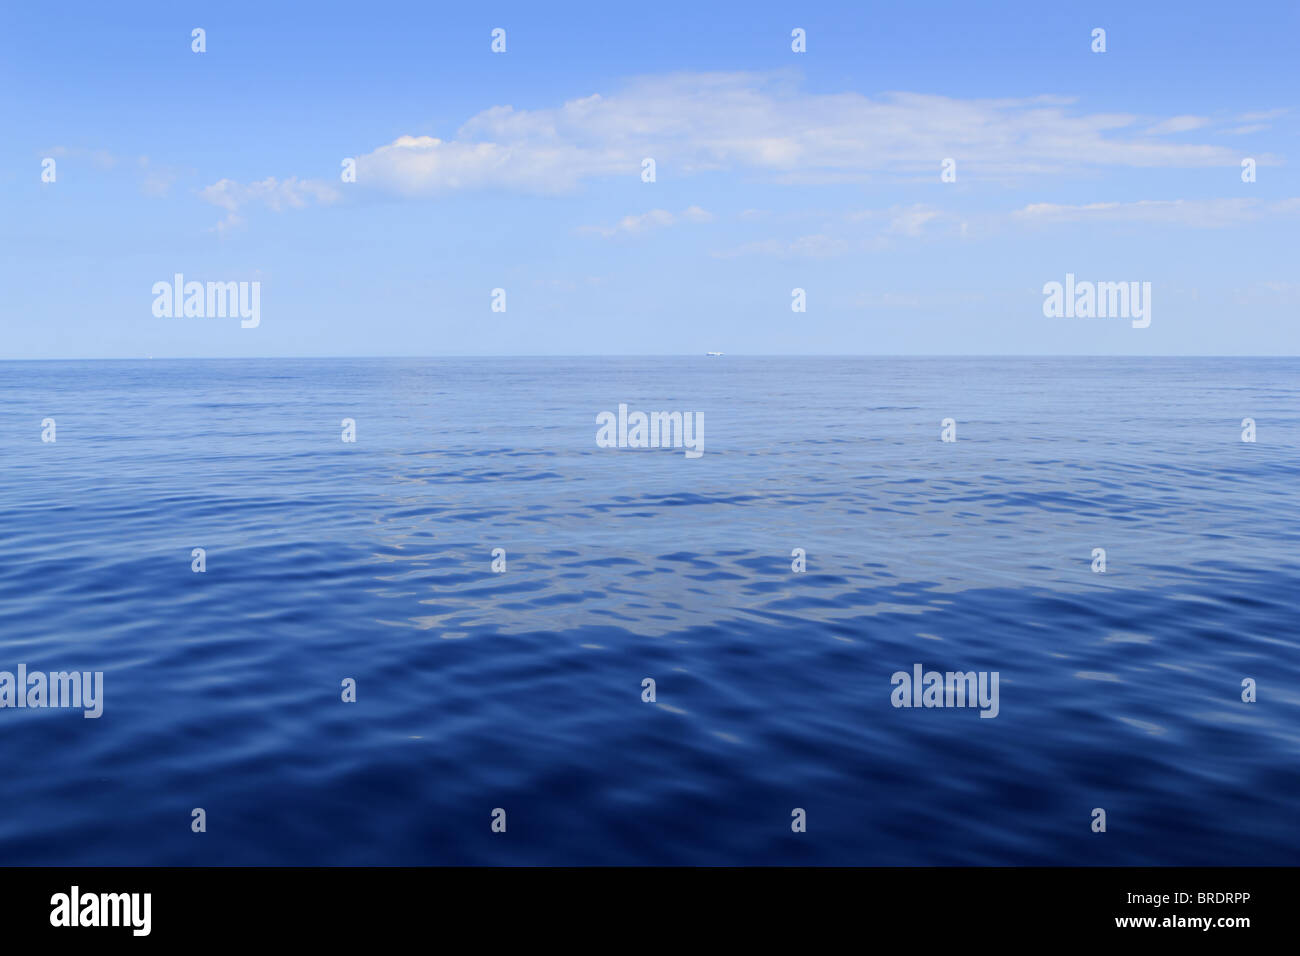 Blue Horizon Océan mer calme parfait en journée ensoleillée méditerranée Photo Stock